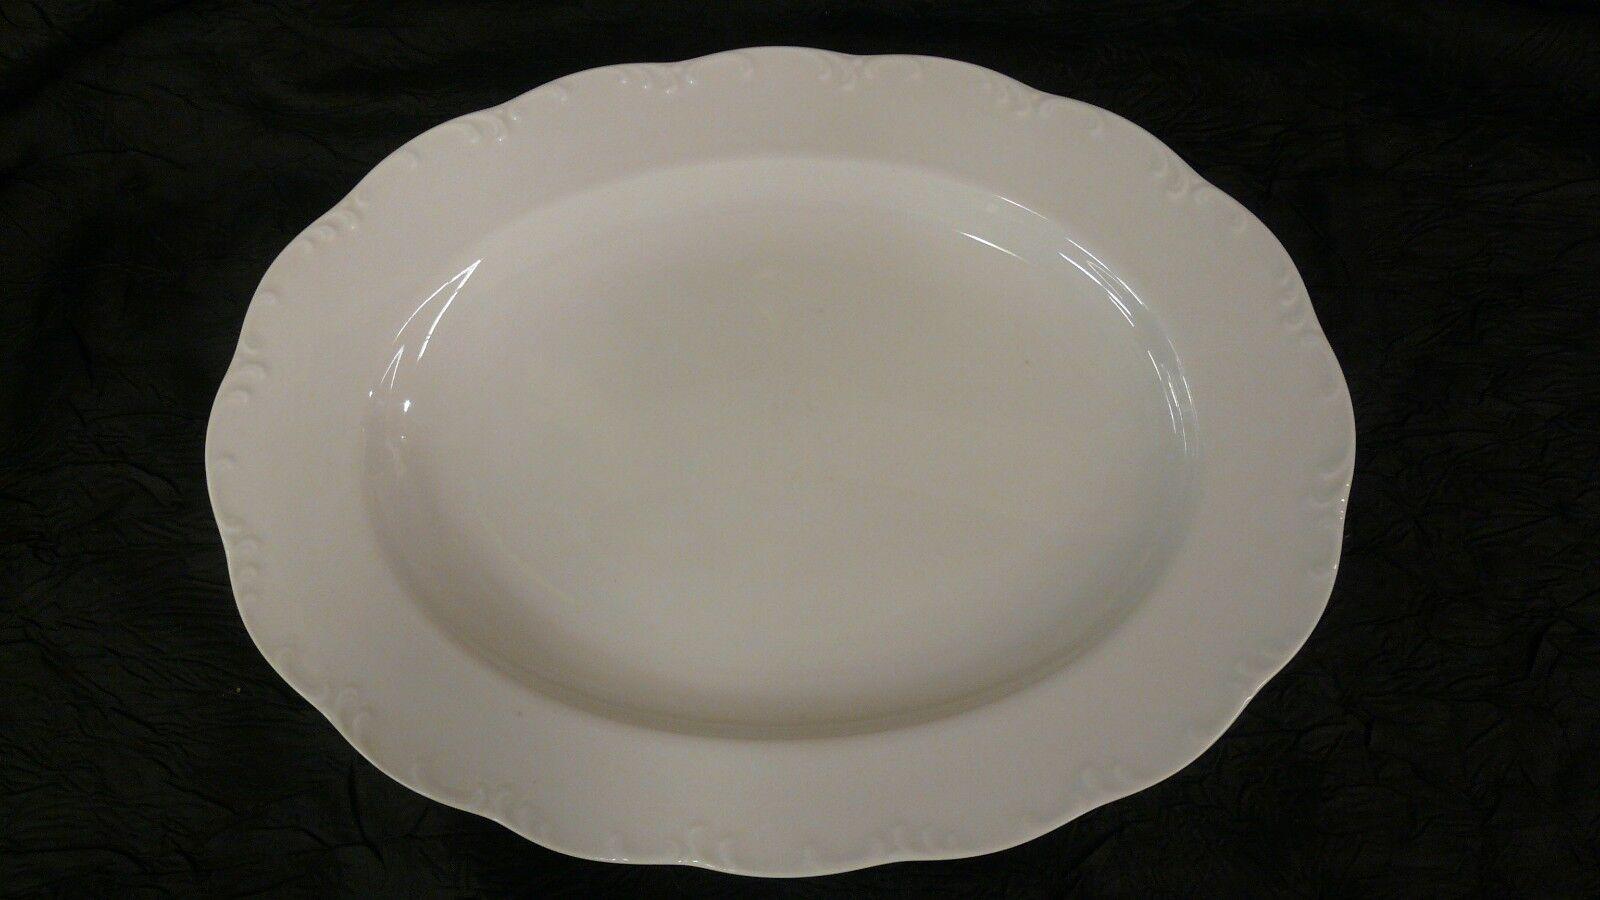 Porzellan Schüssel Servierschüssel Schale oval  weiß Obstschale ca.30,5x16,5 cm.